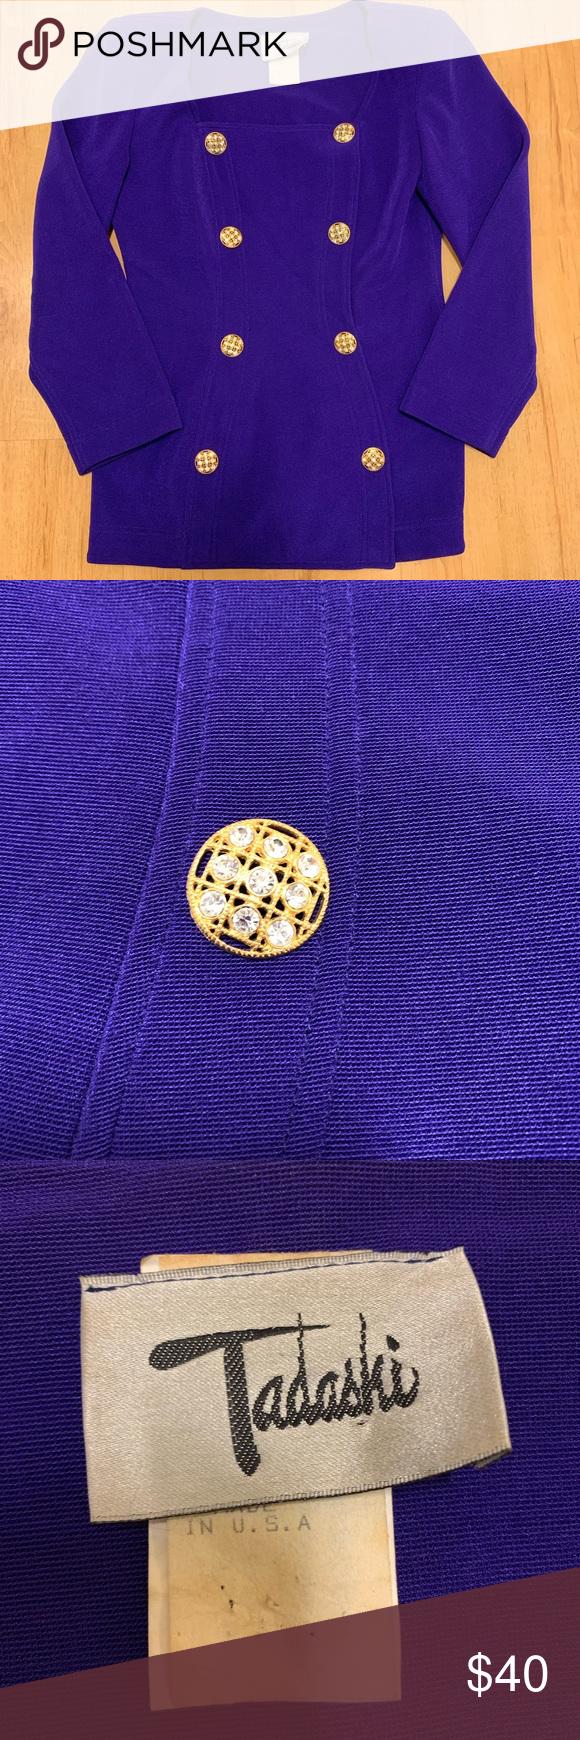 TADASHI vtg. blazer top purple rhinestone buttons Tadashi vintage luxurious spec…